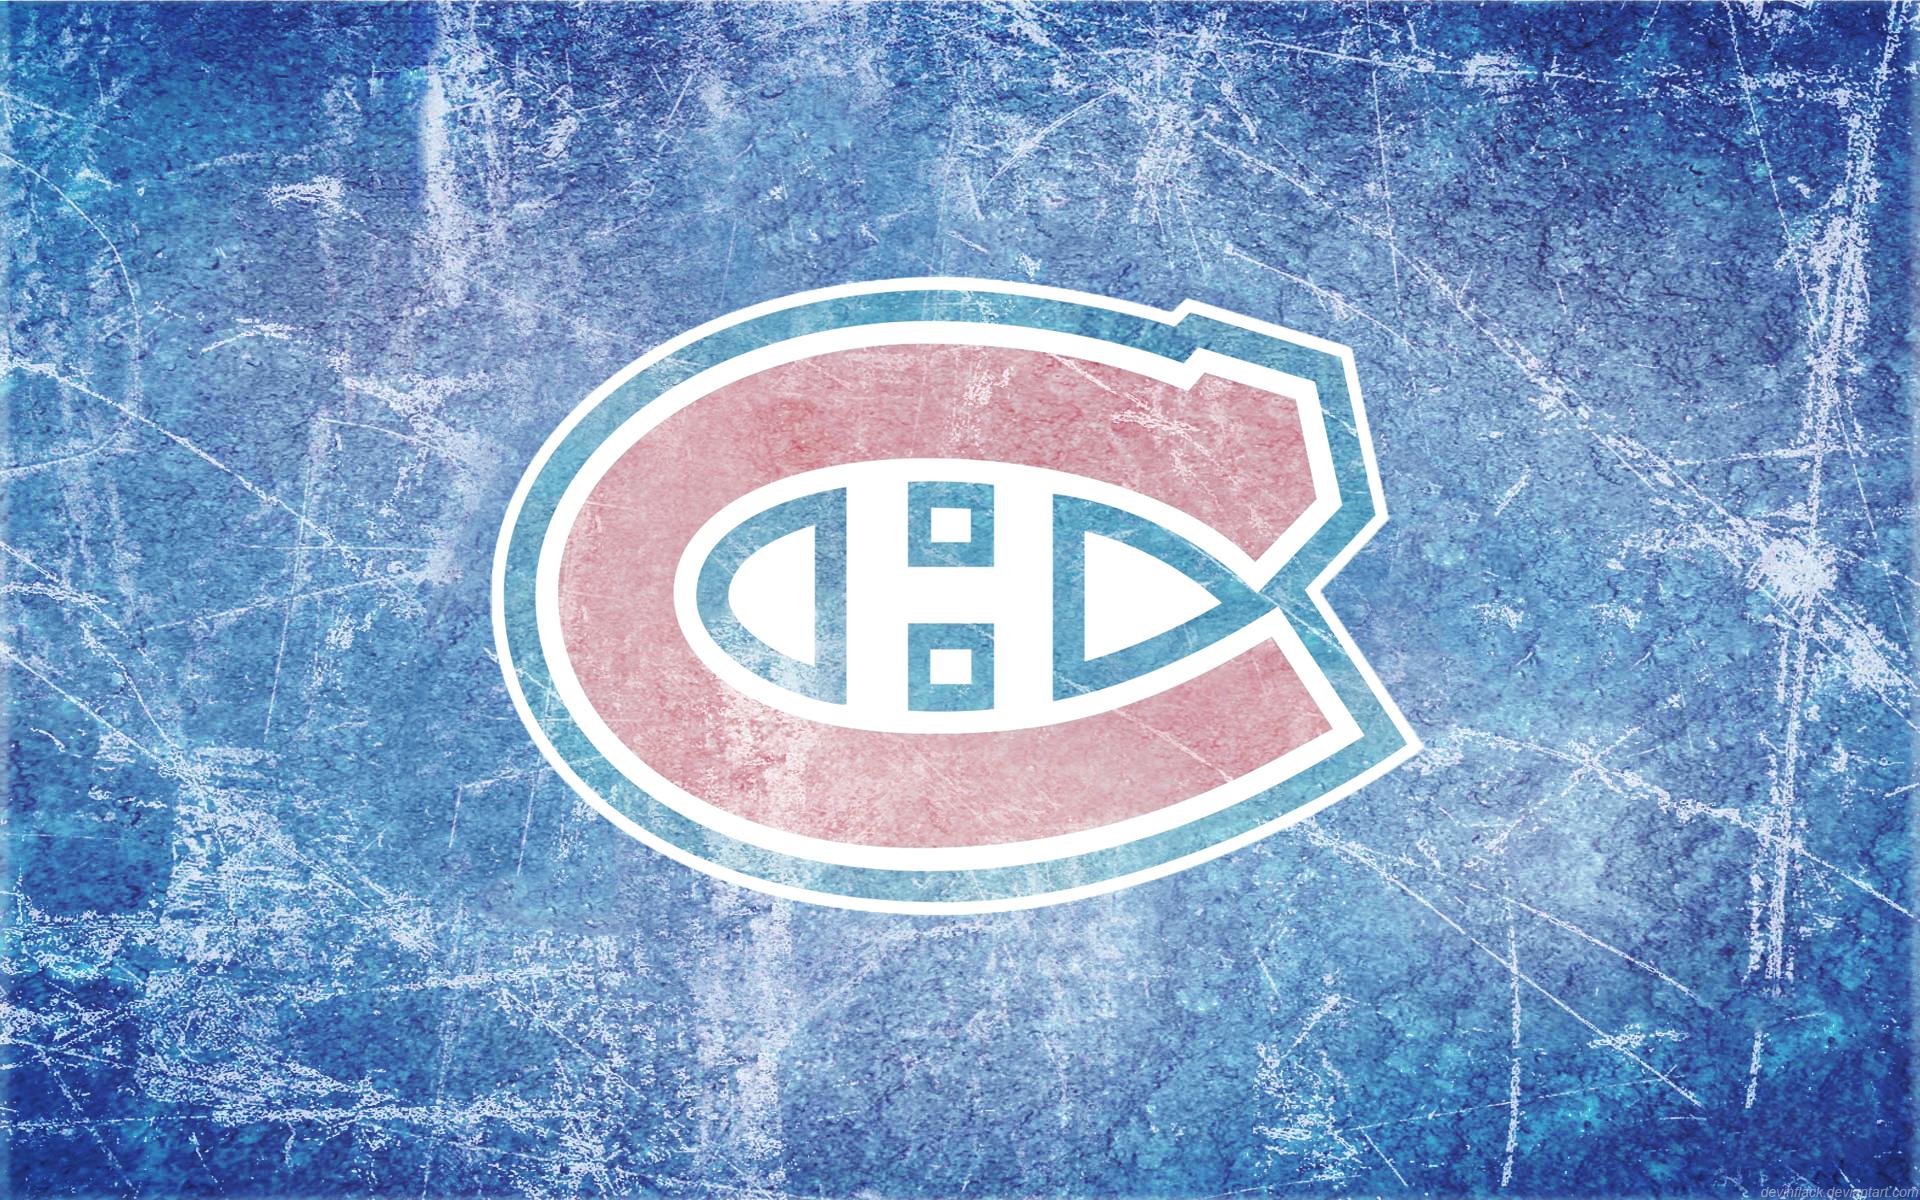 Montreal Canadiens wallpaper   330477 1920x1200